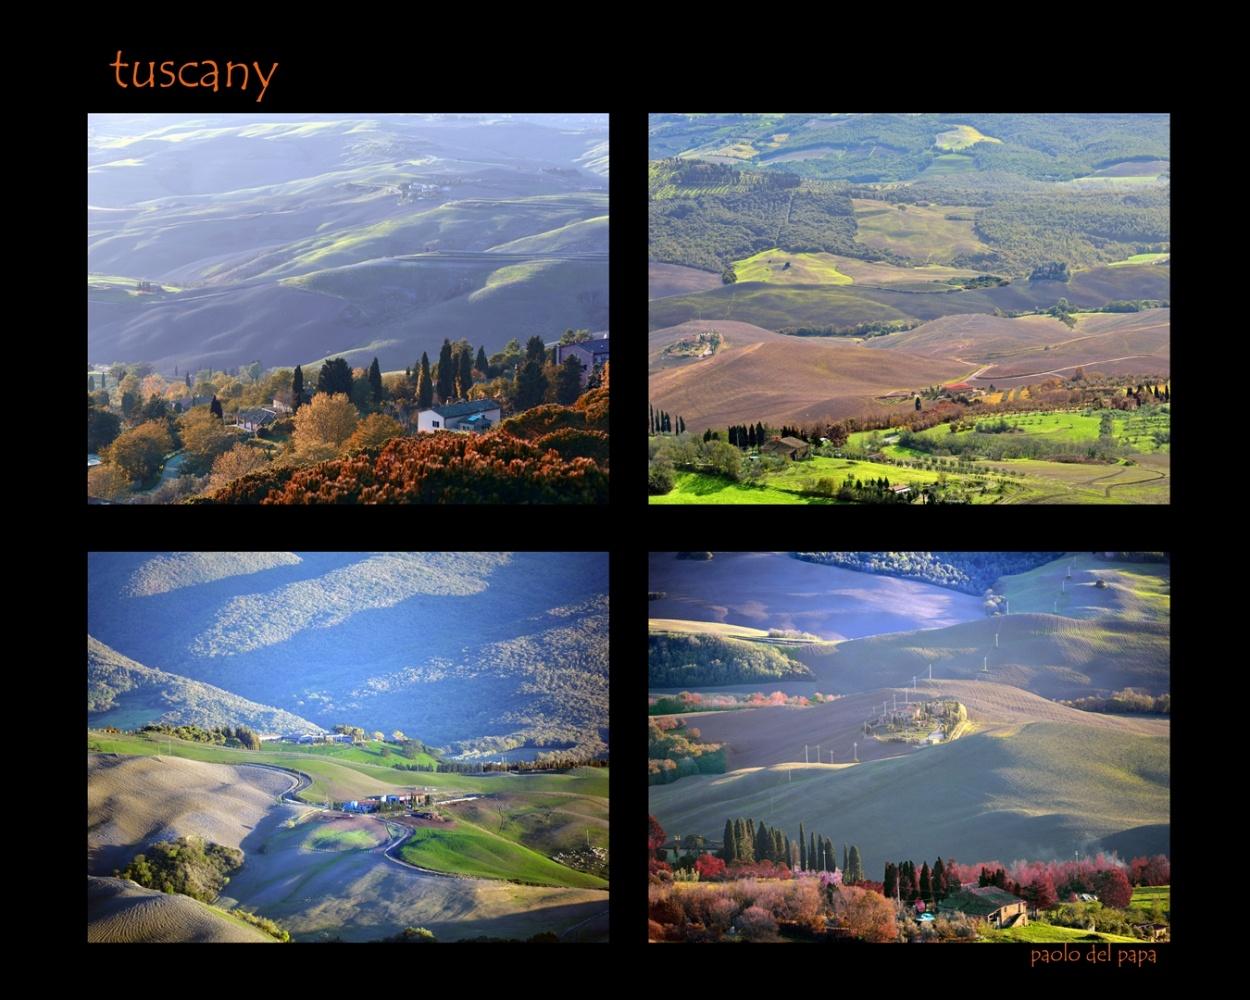 copyright Paolo del Papa - www.paolodelpapafoto.org